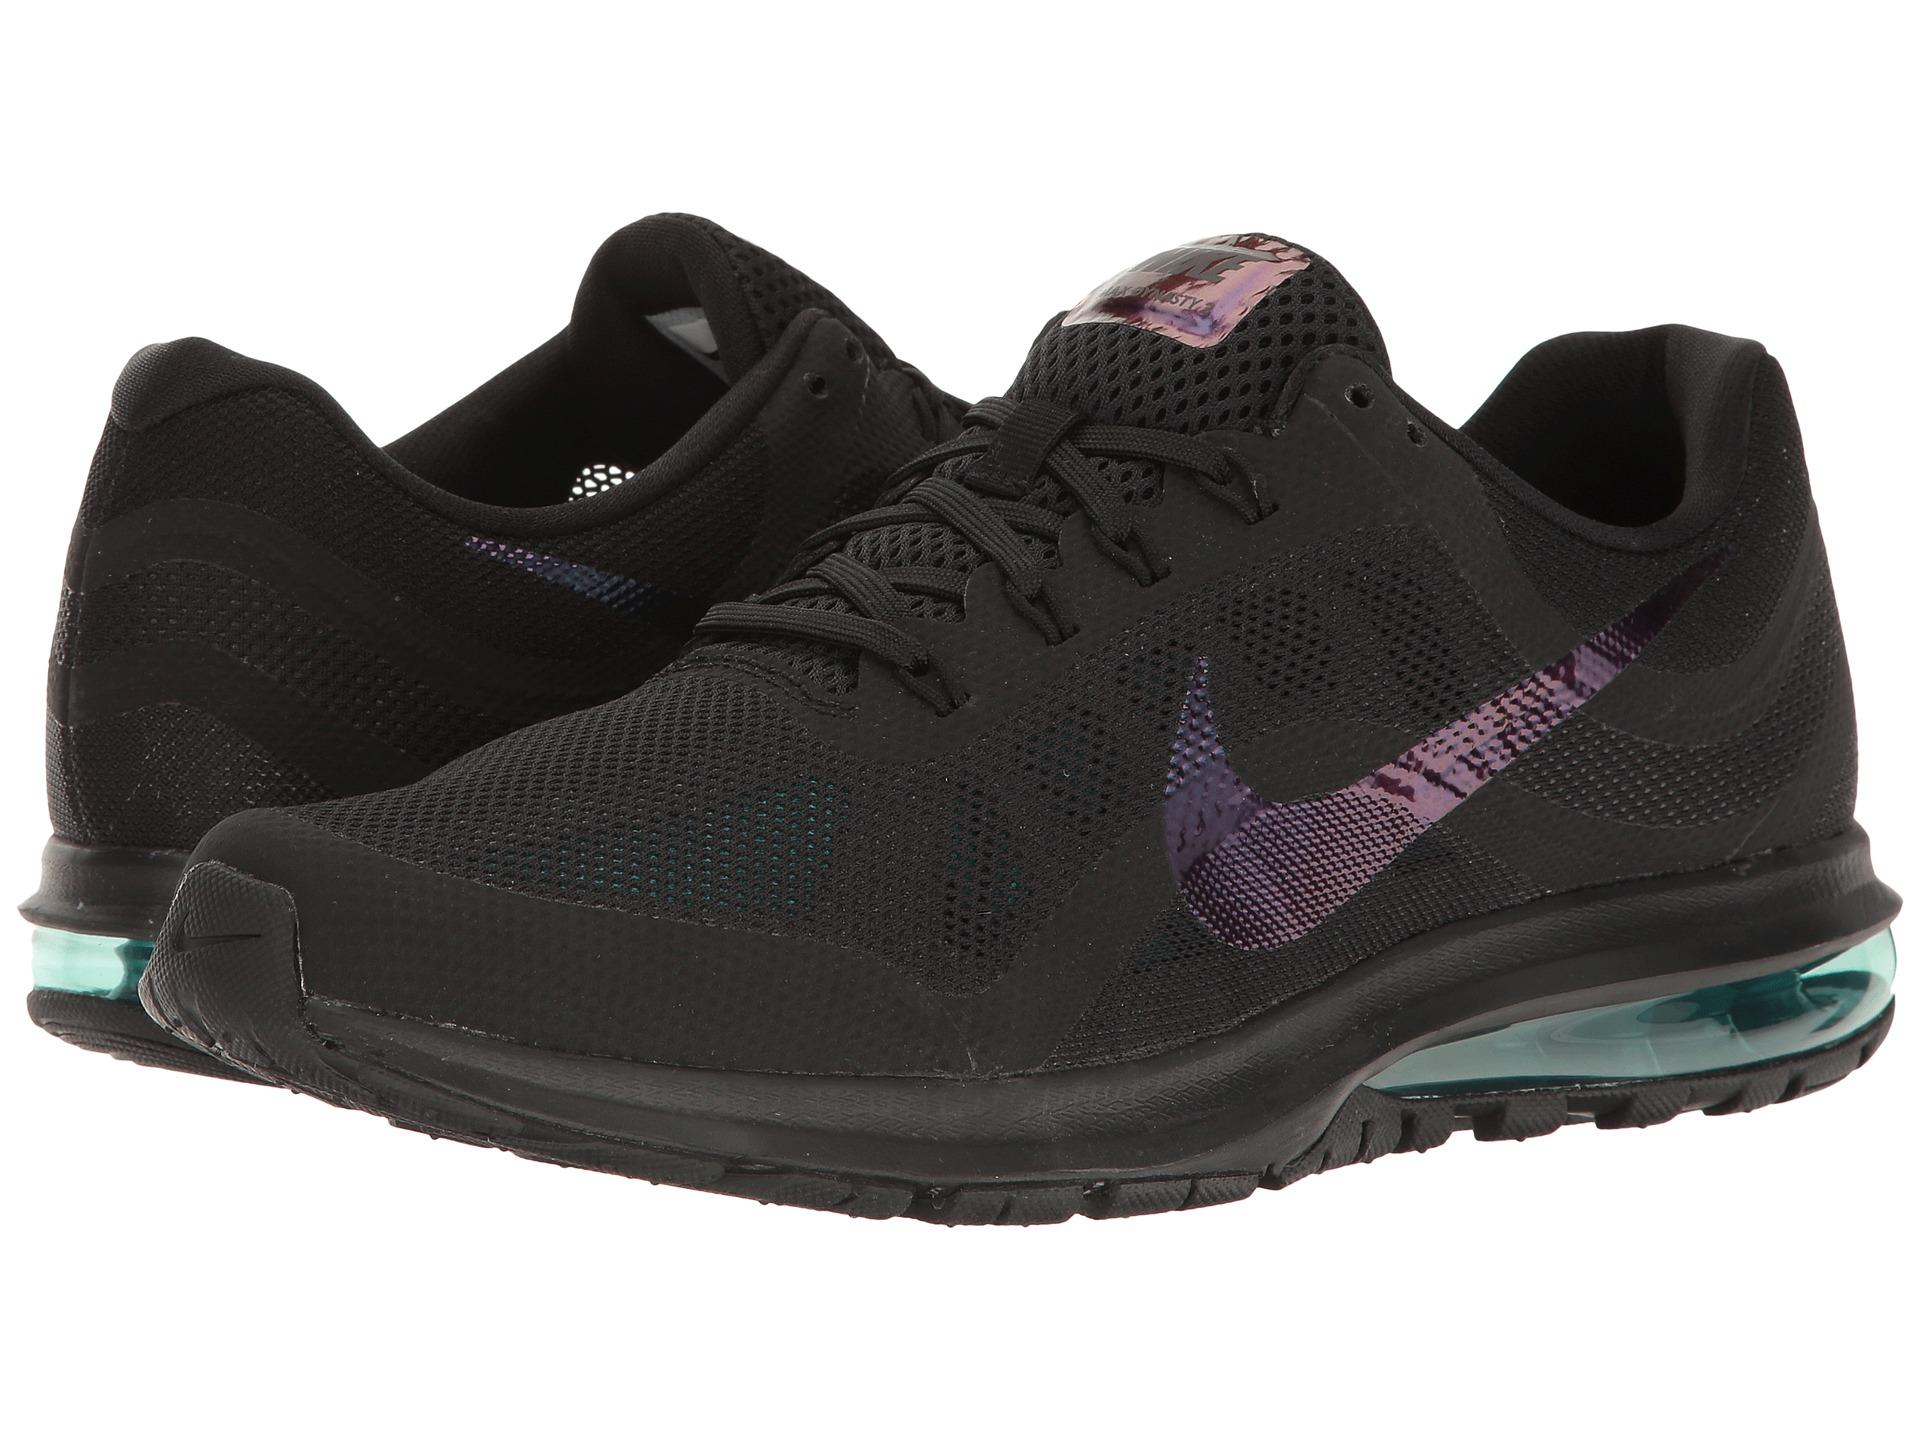 2e8179e88e Nike Air Max Dynasty 2 Bts in Black for Men - Lyst